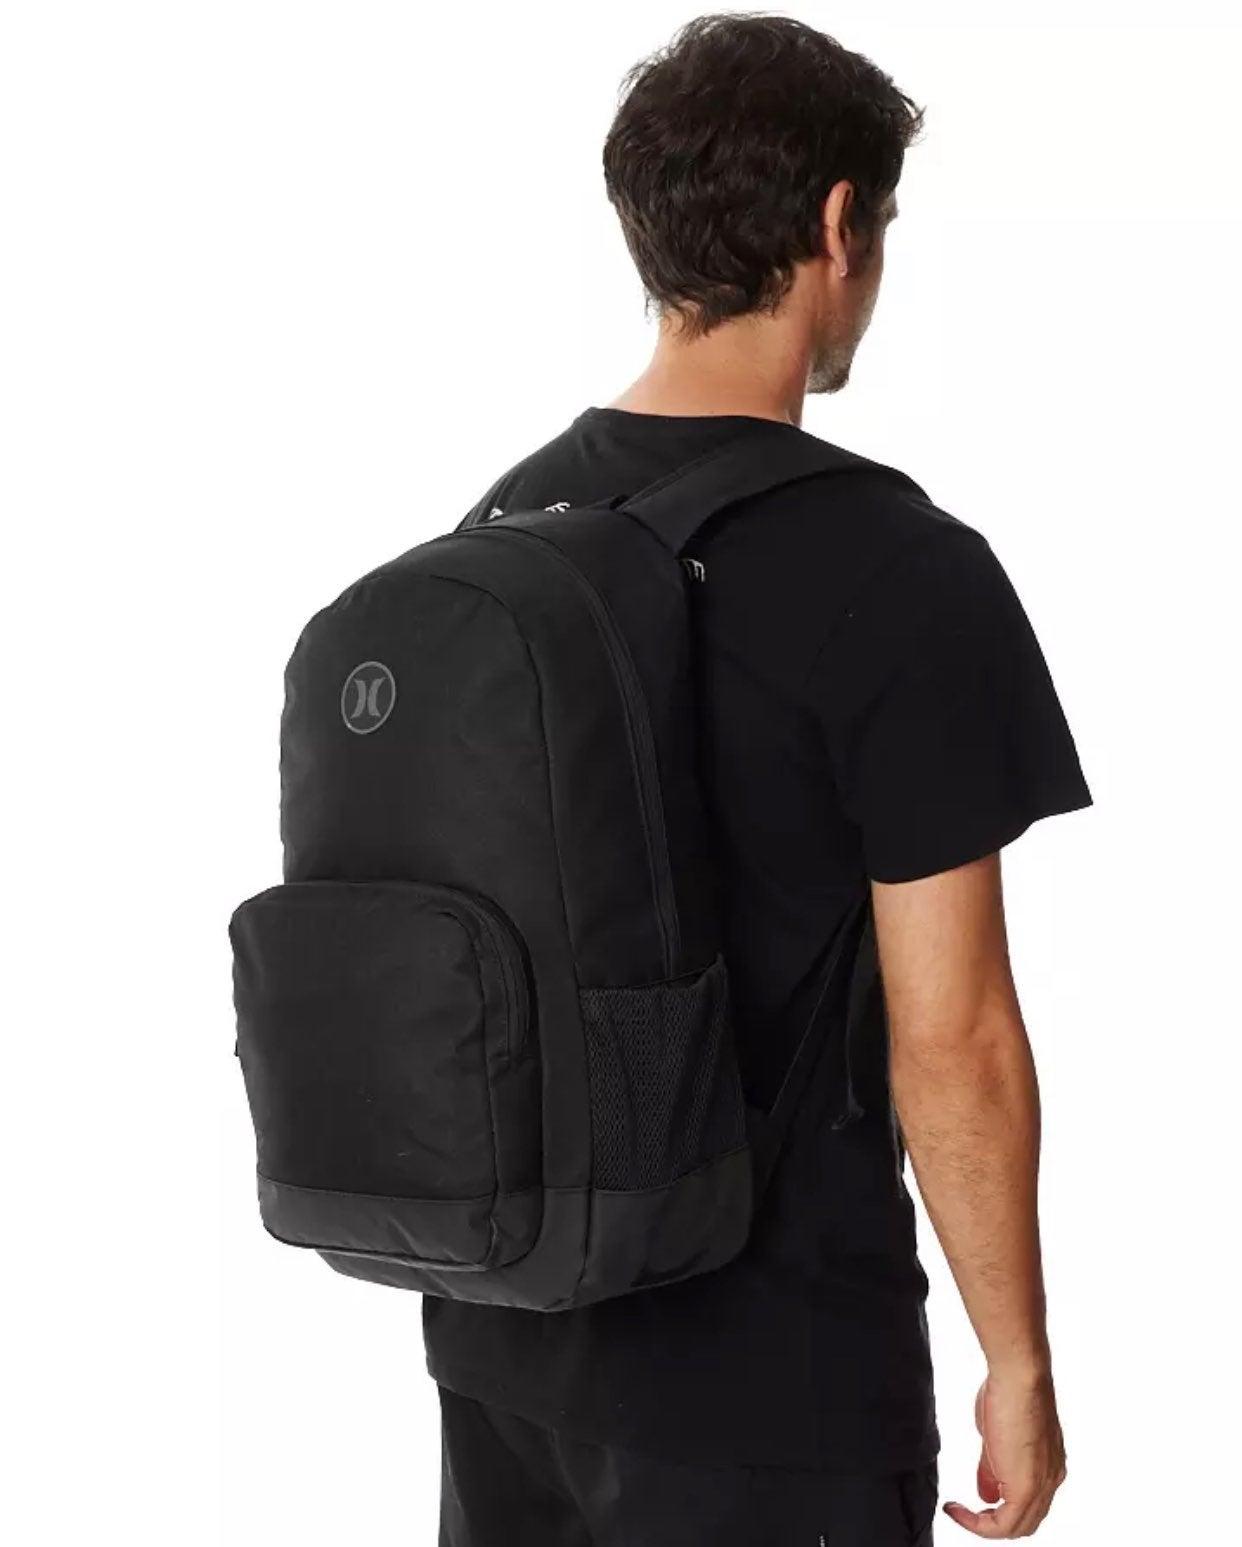 Hurley Renegade Solid Backpack Black NWT